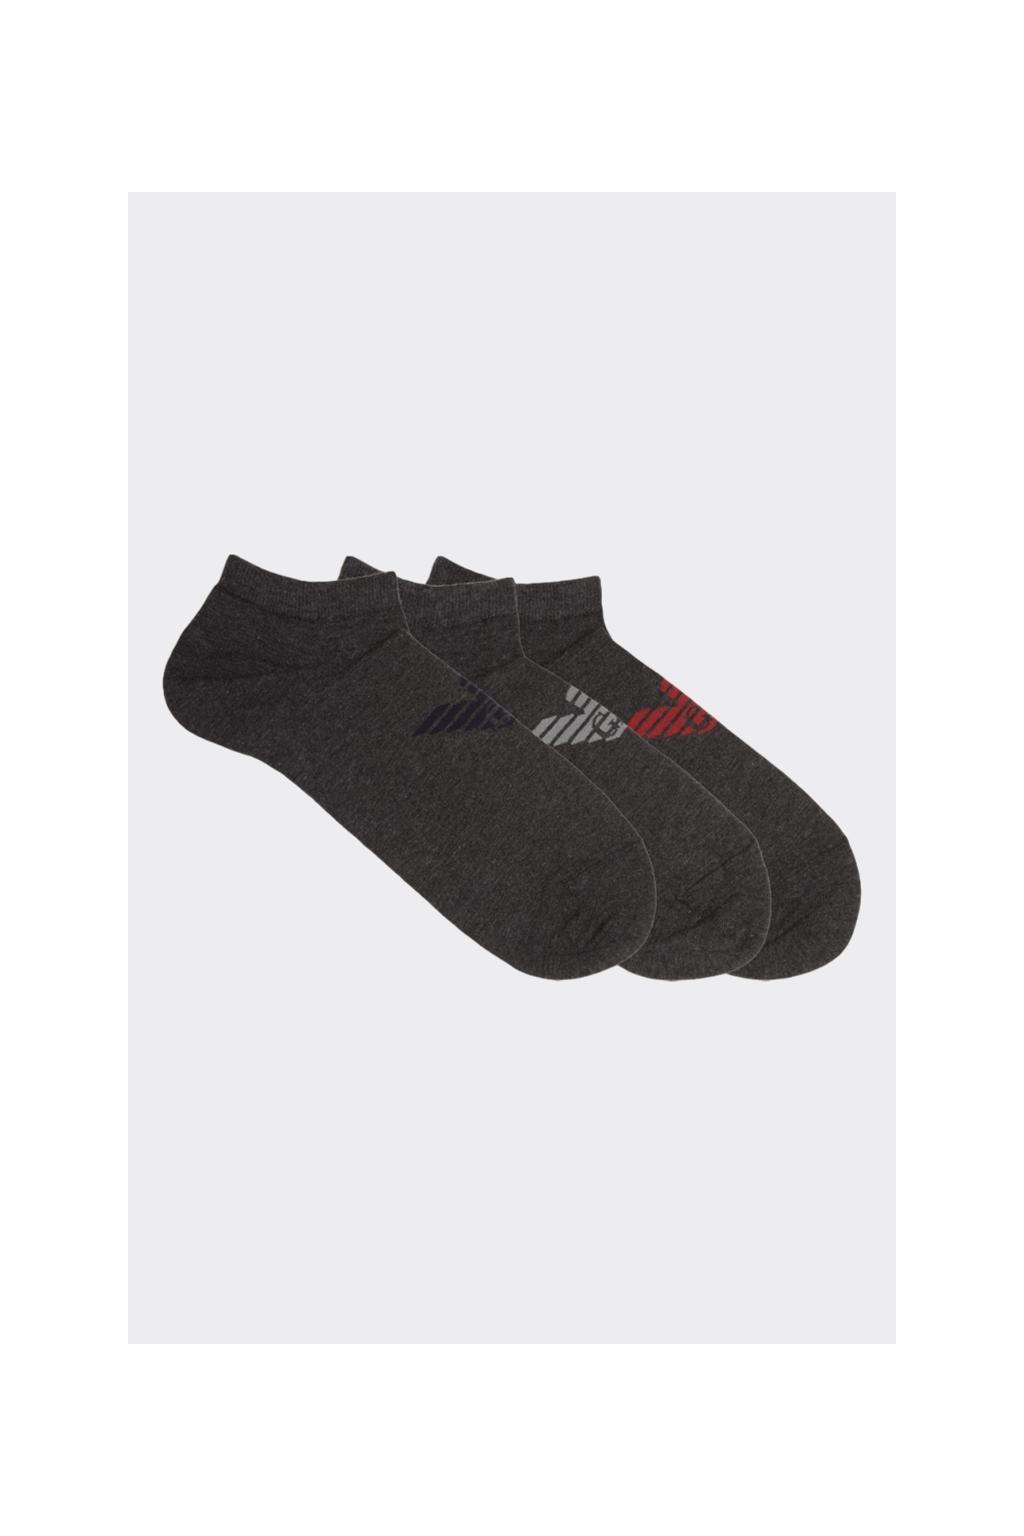 Emporio Armani pánské ponožky 3-balení - šedé